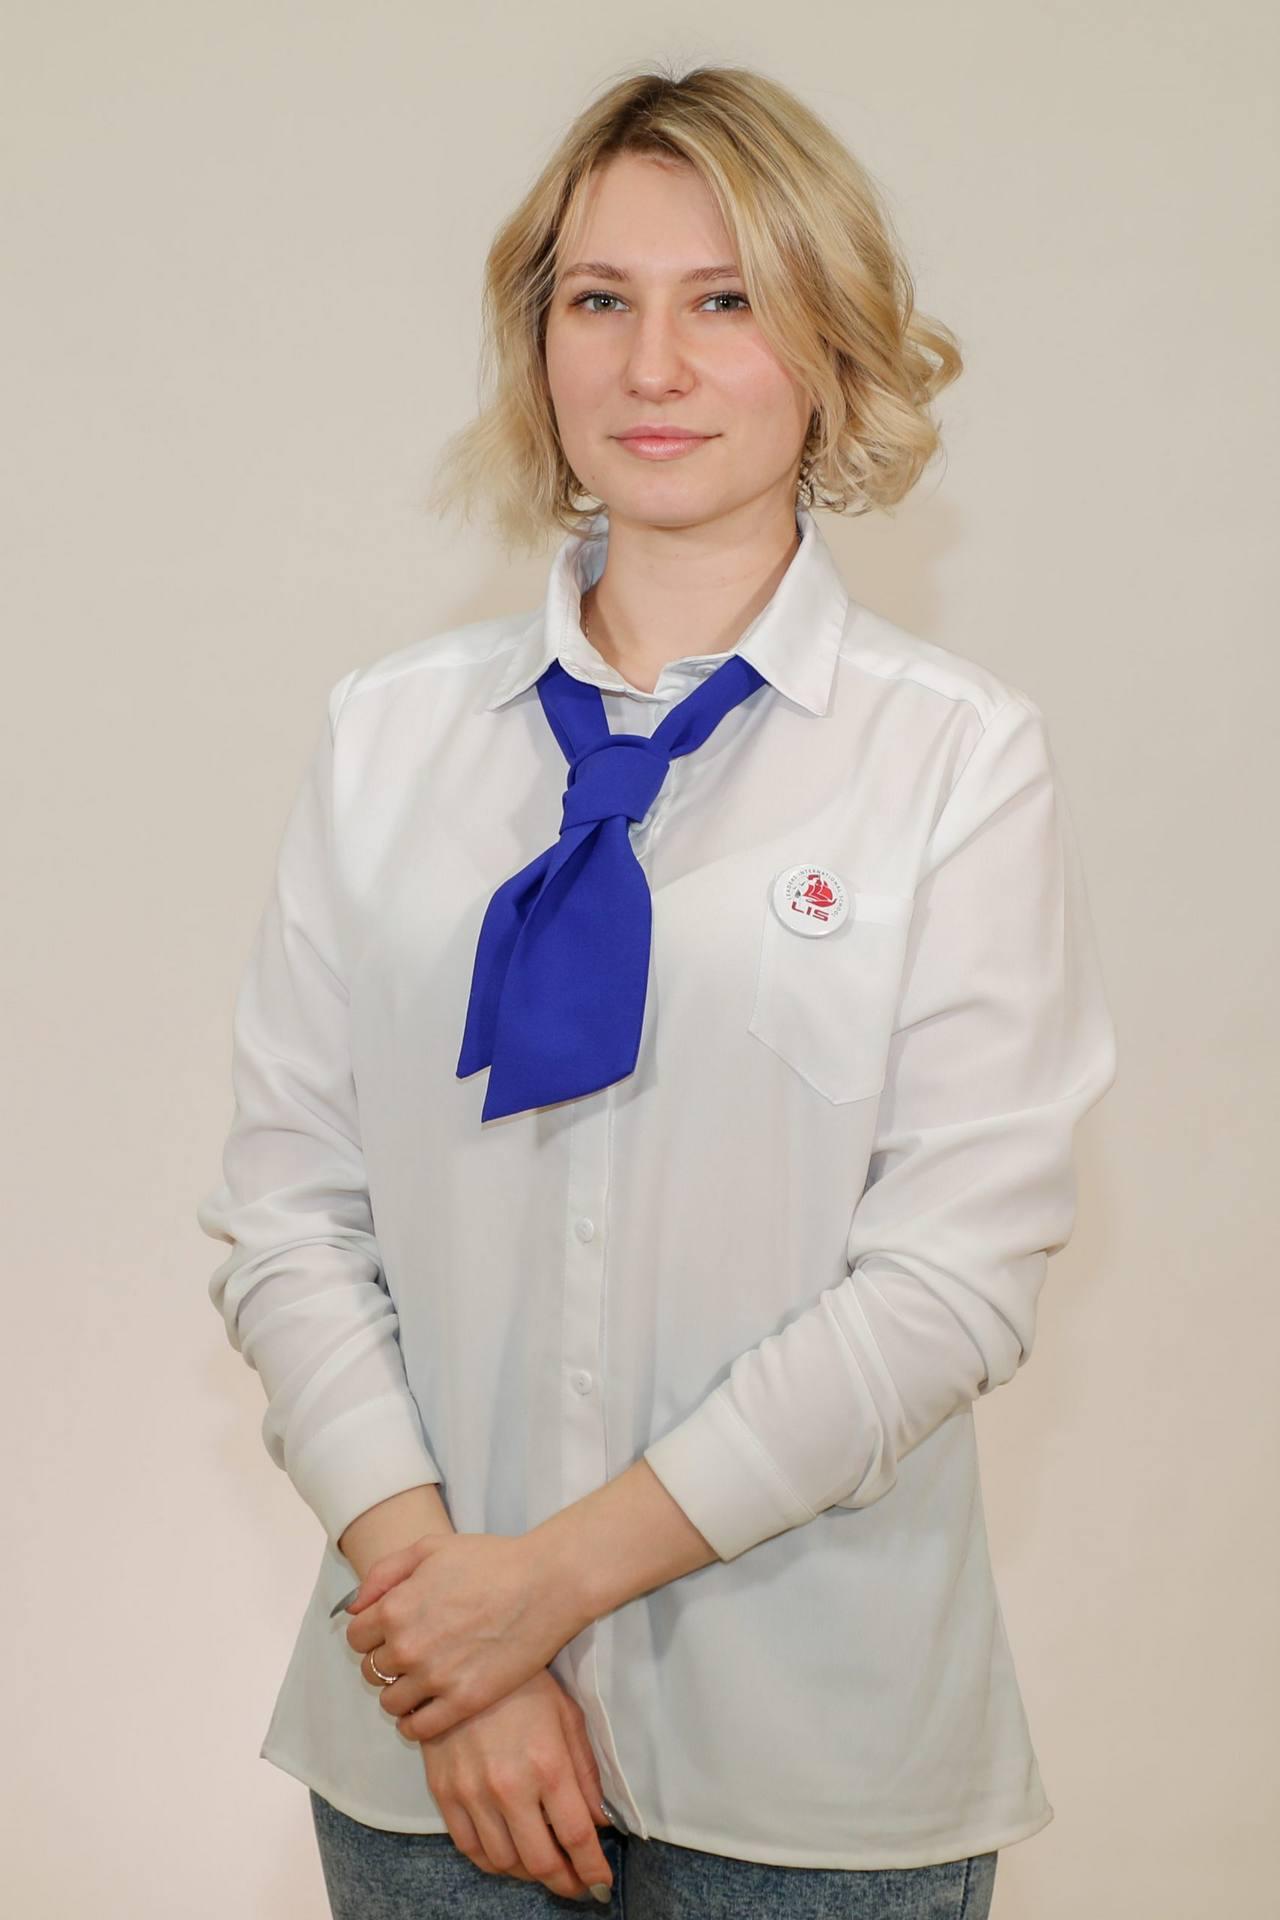 Евтеева Ульяна Владимировна